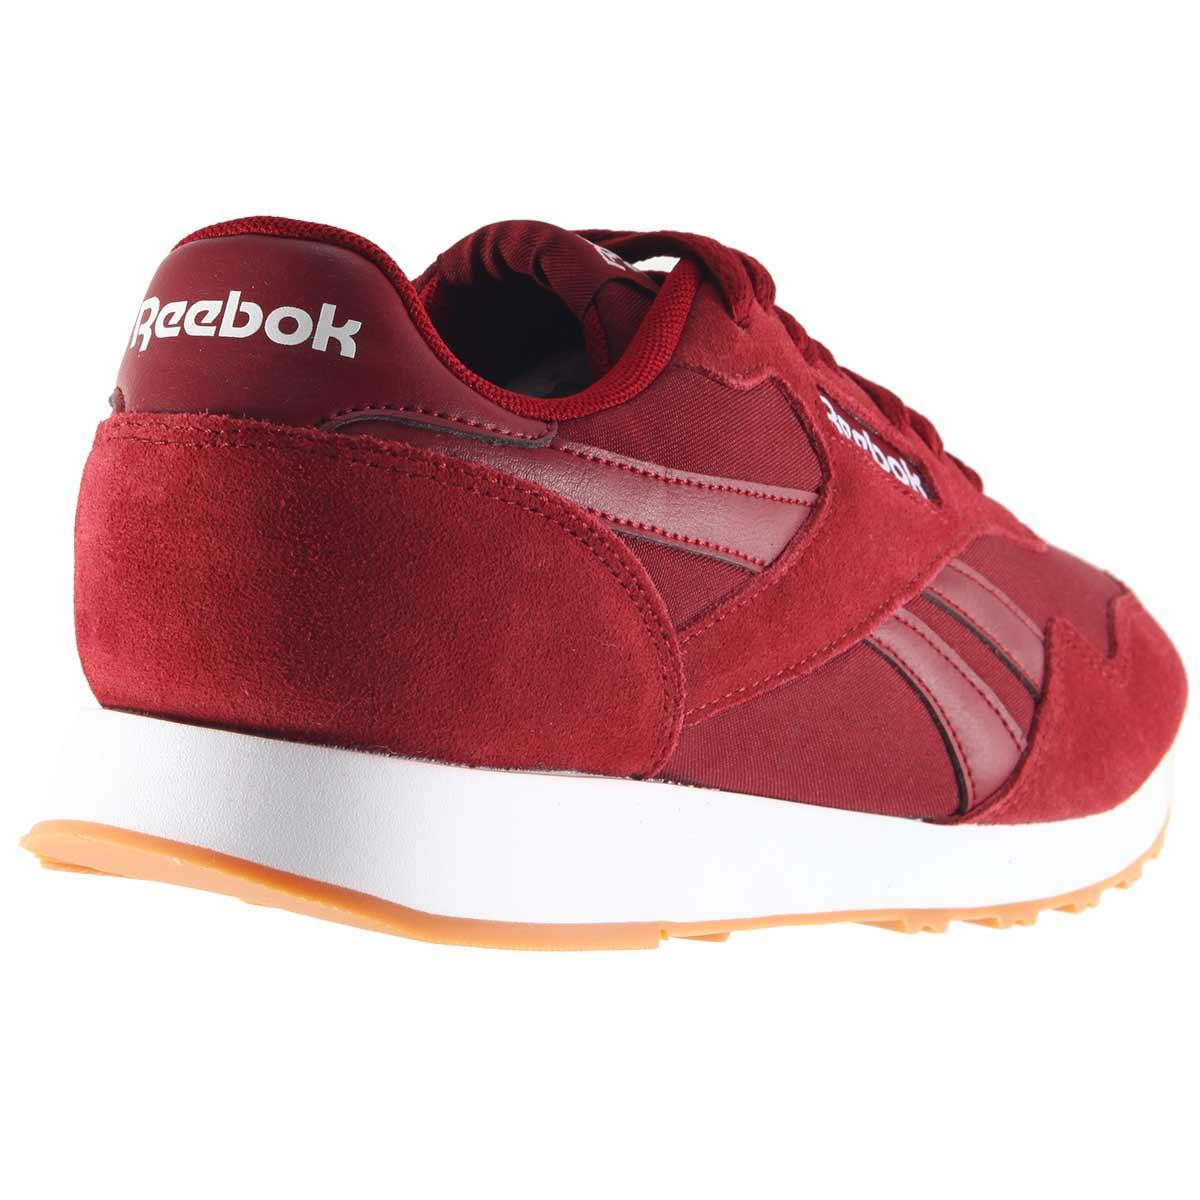 Tênis Reebok Royal Ultra Masculino Jogging BS7971/BS7972  - Ian Calçados